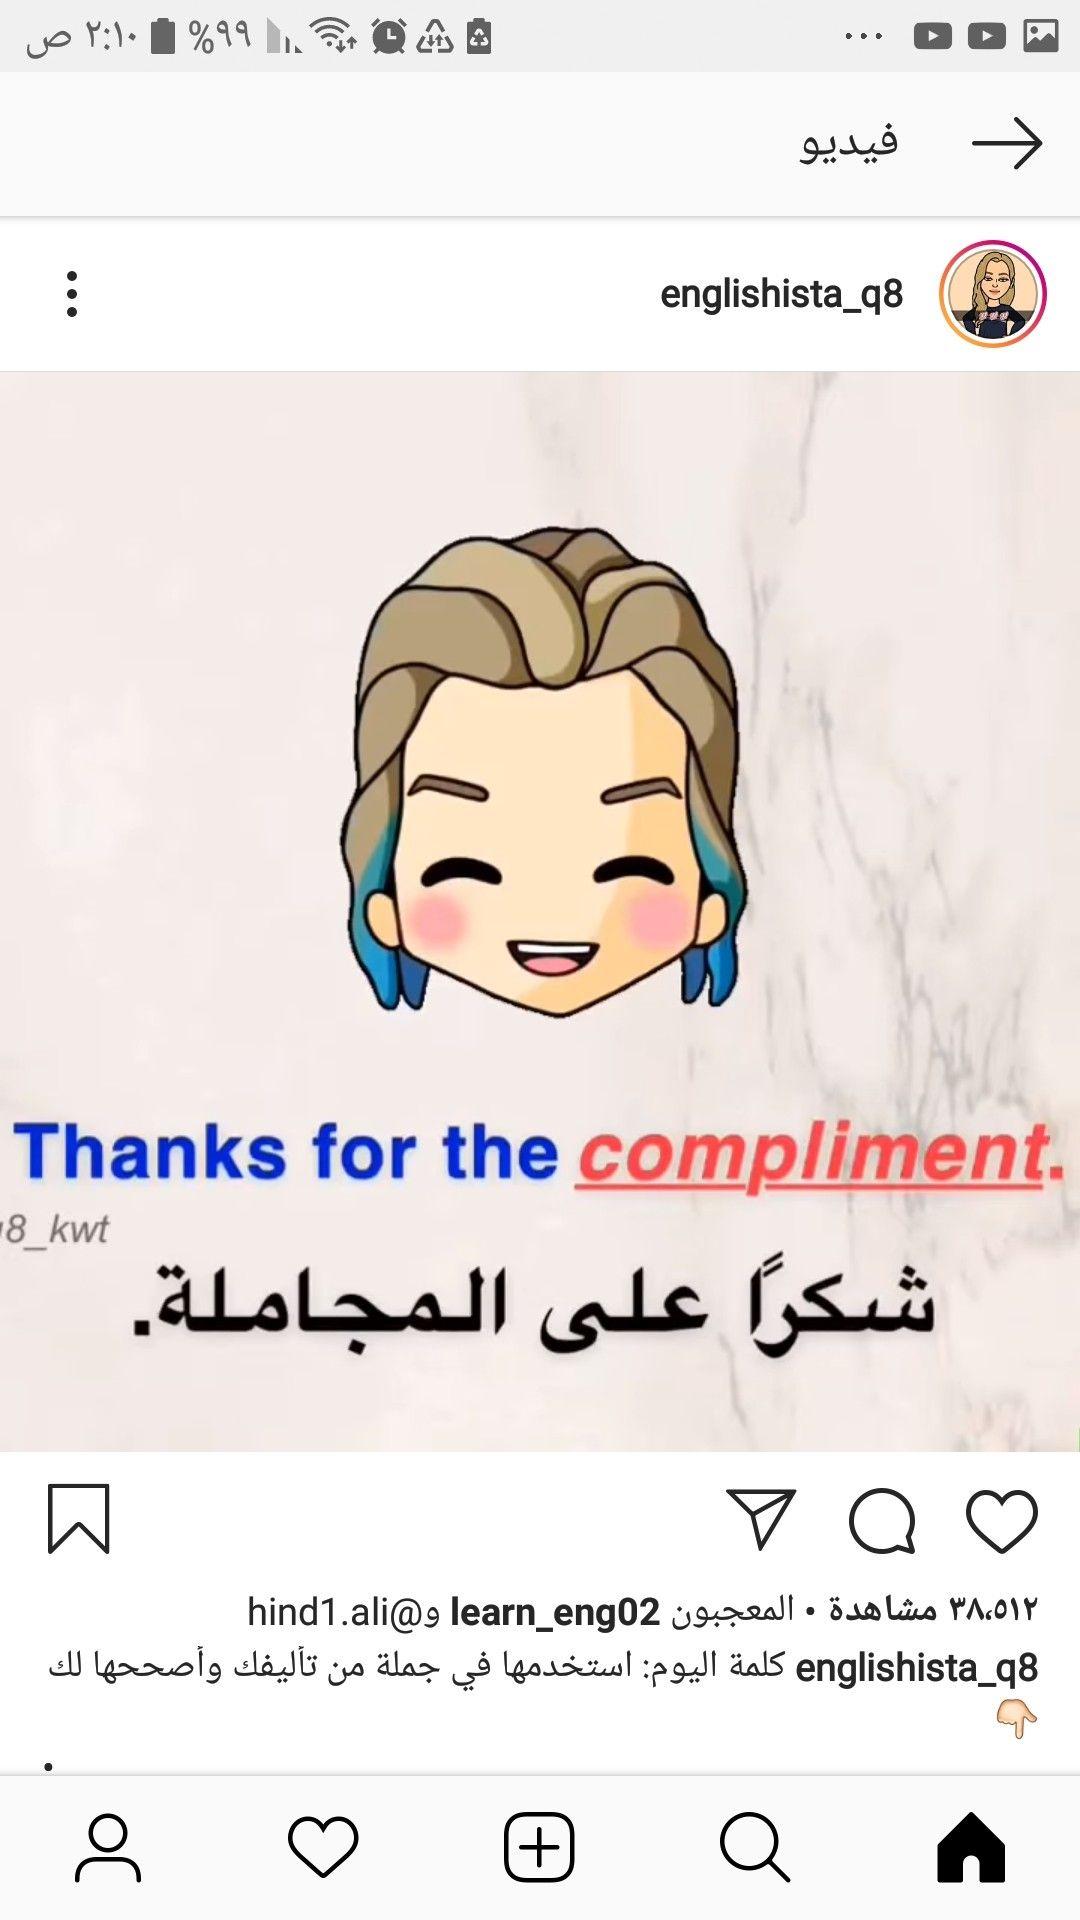 Learning Arabic Msa Fabiennem English Phrases Learn English Vocabulary English Words